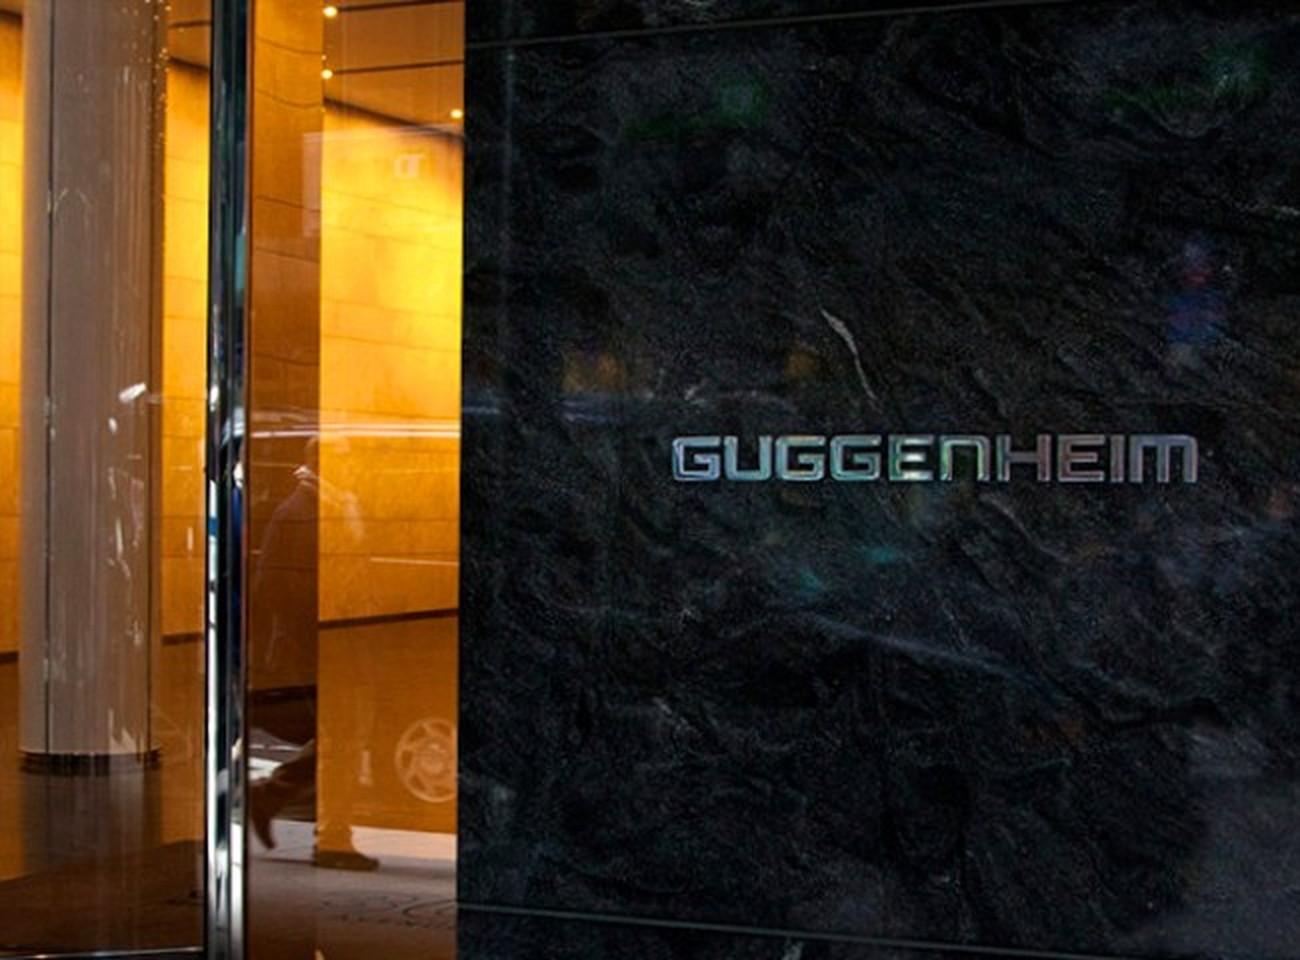 Guggenheim Partners Careers